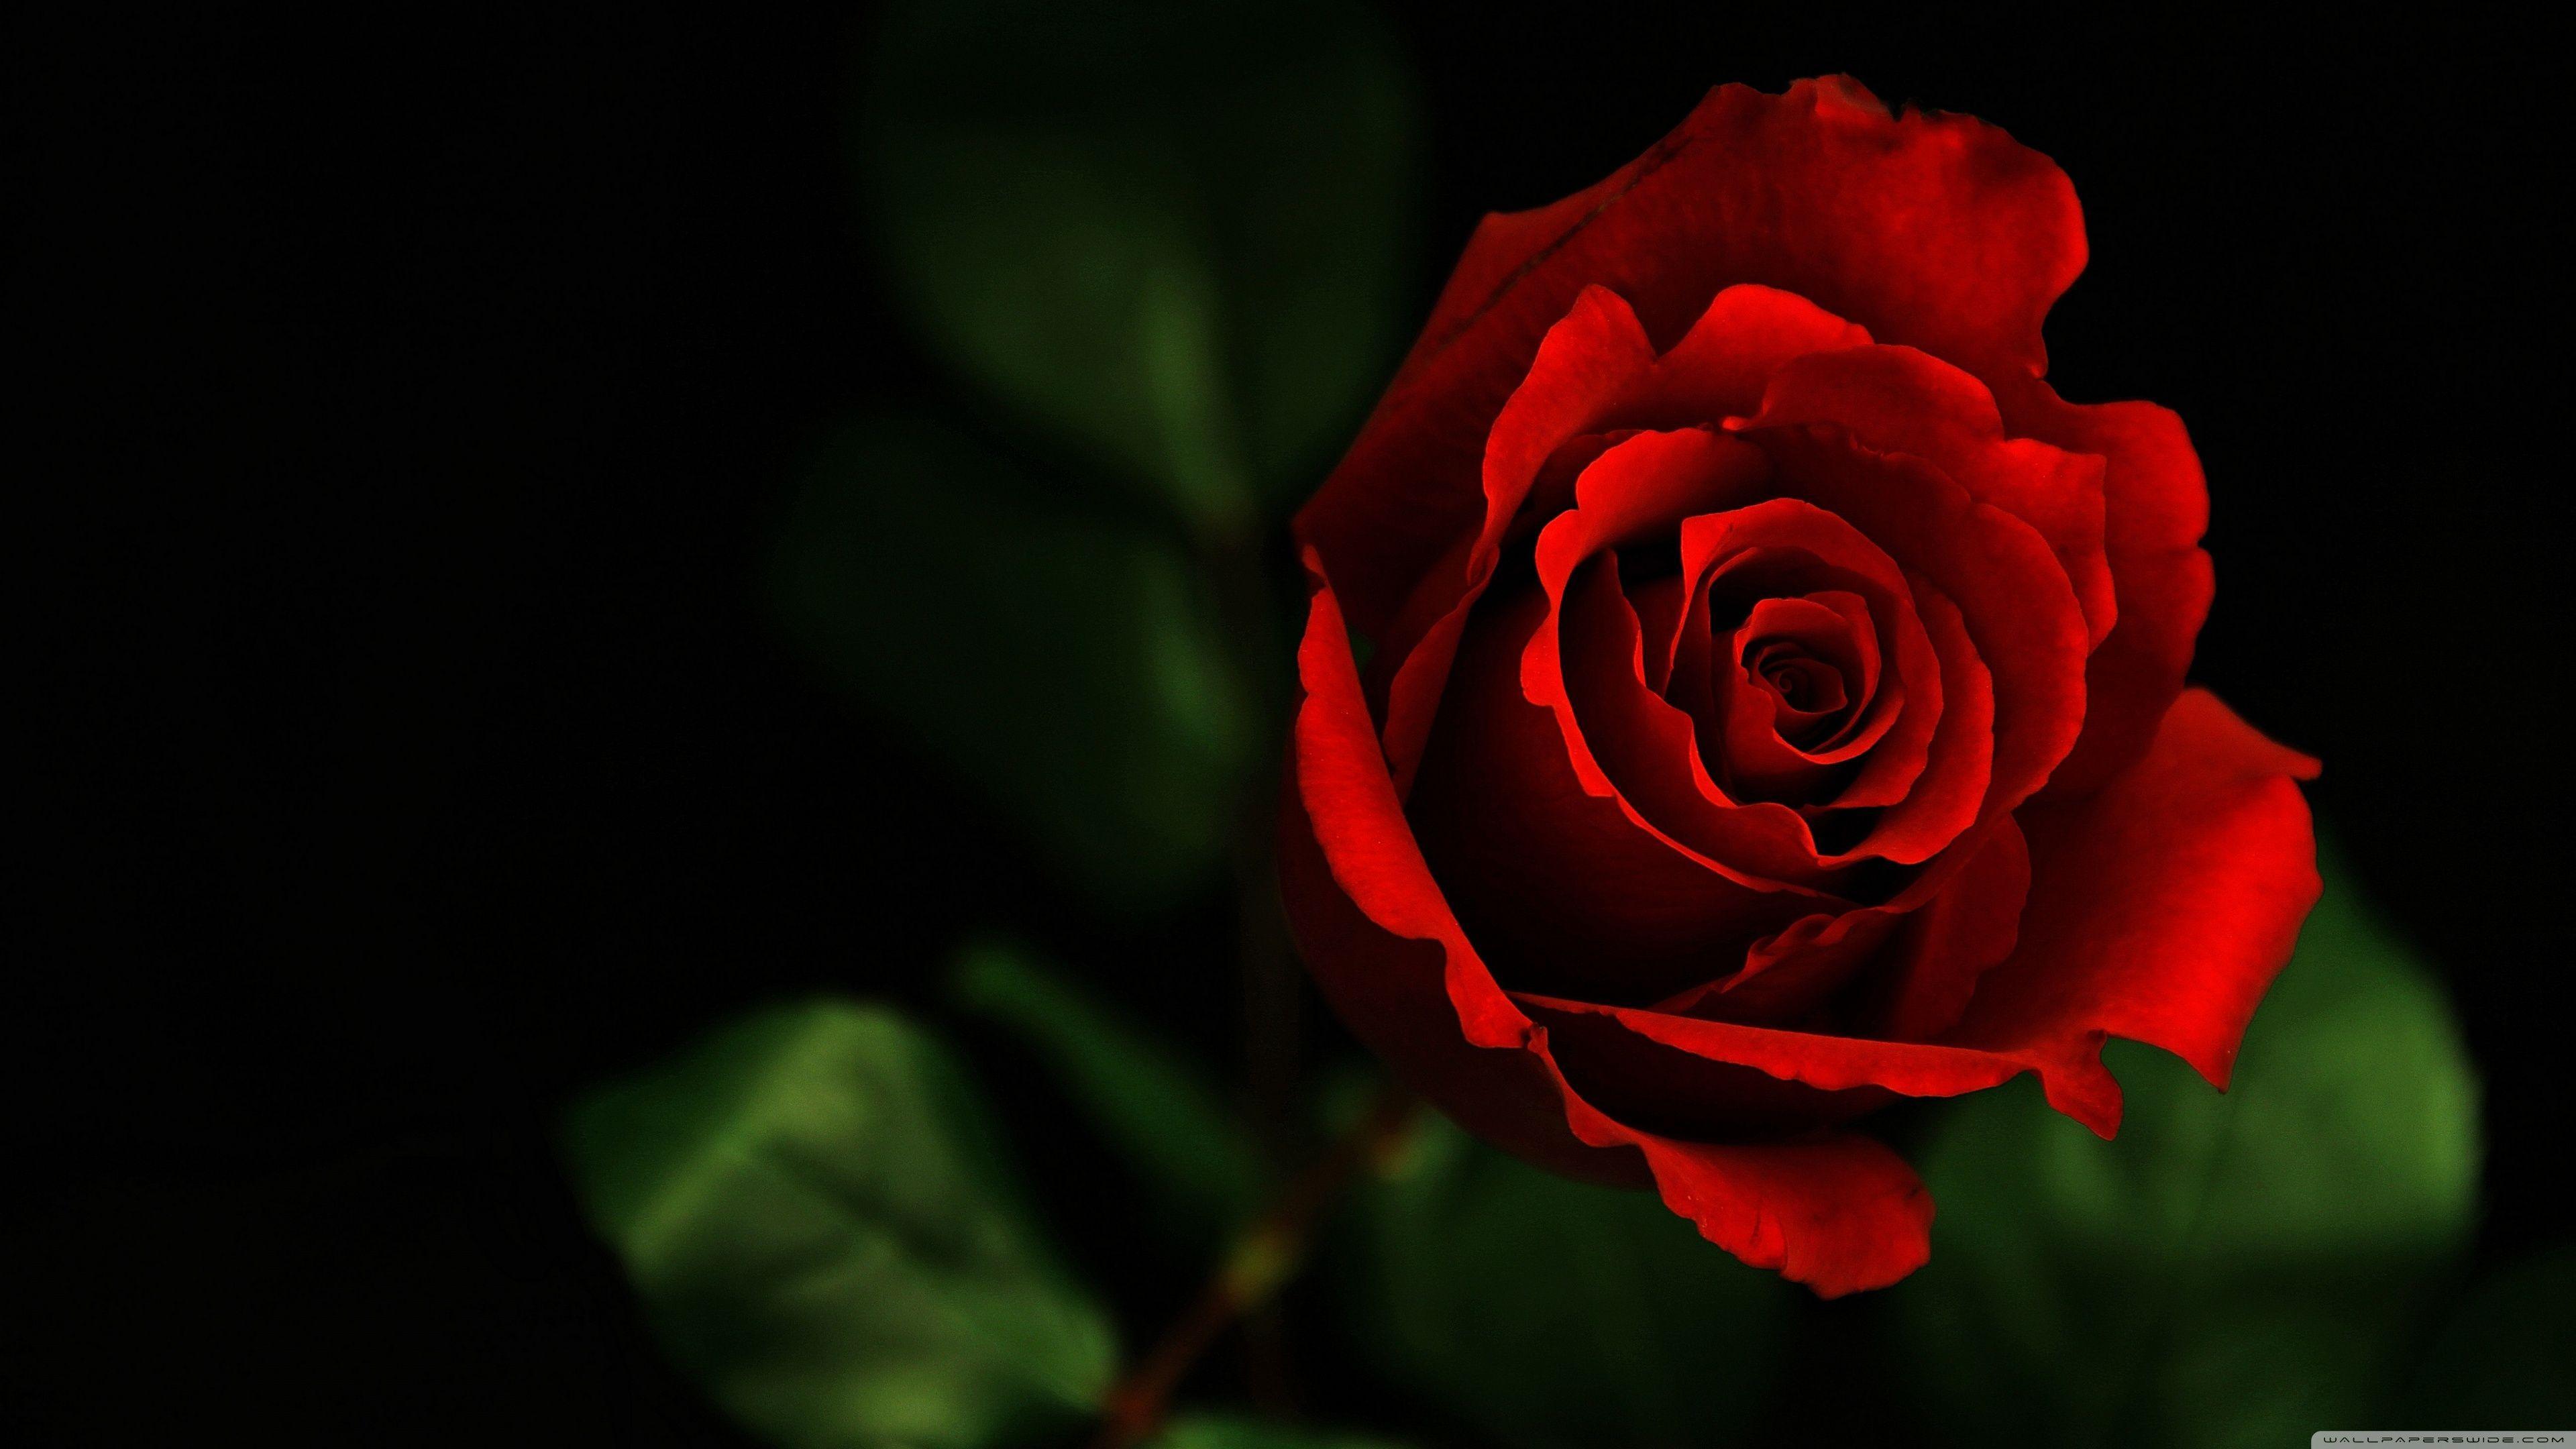 One Red Rose HD Desktop Wallpapers - Wallpaper Cave